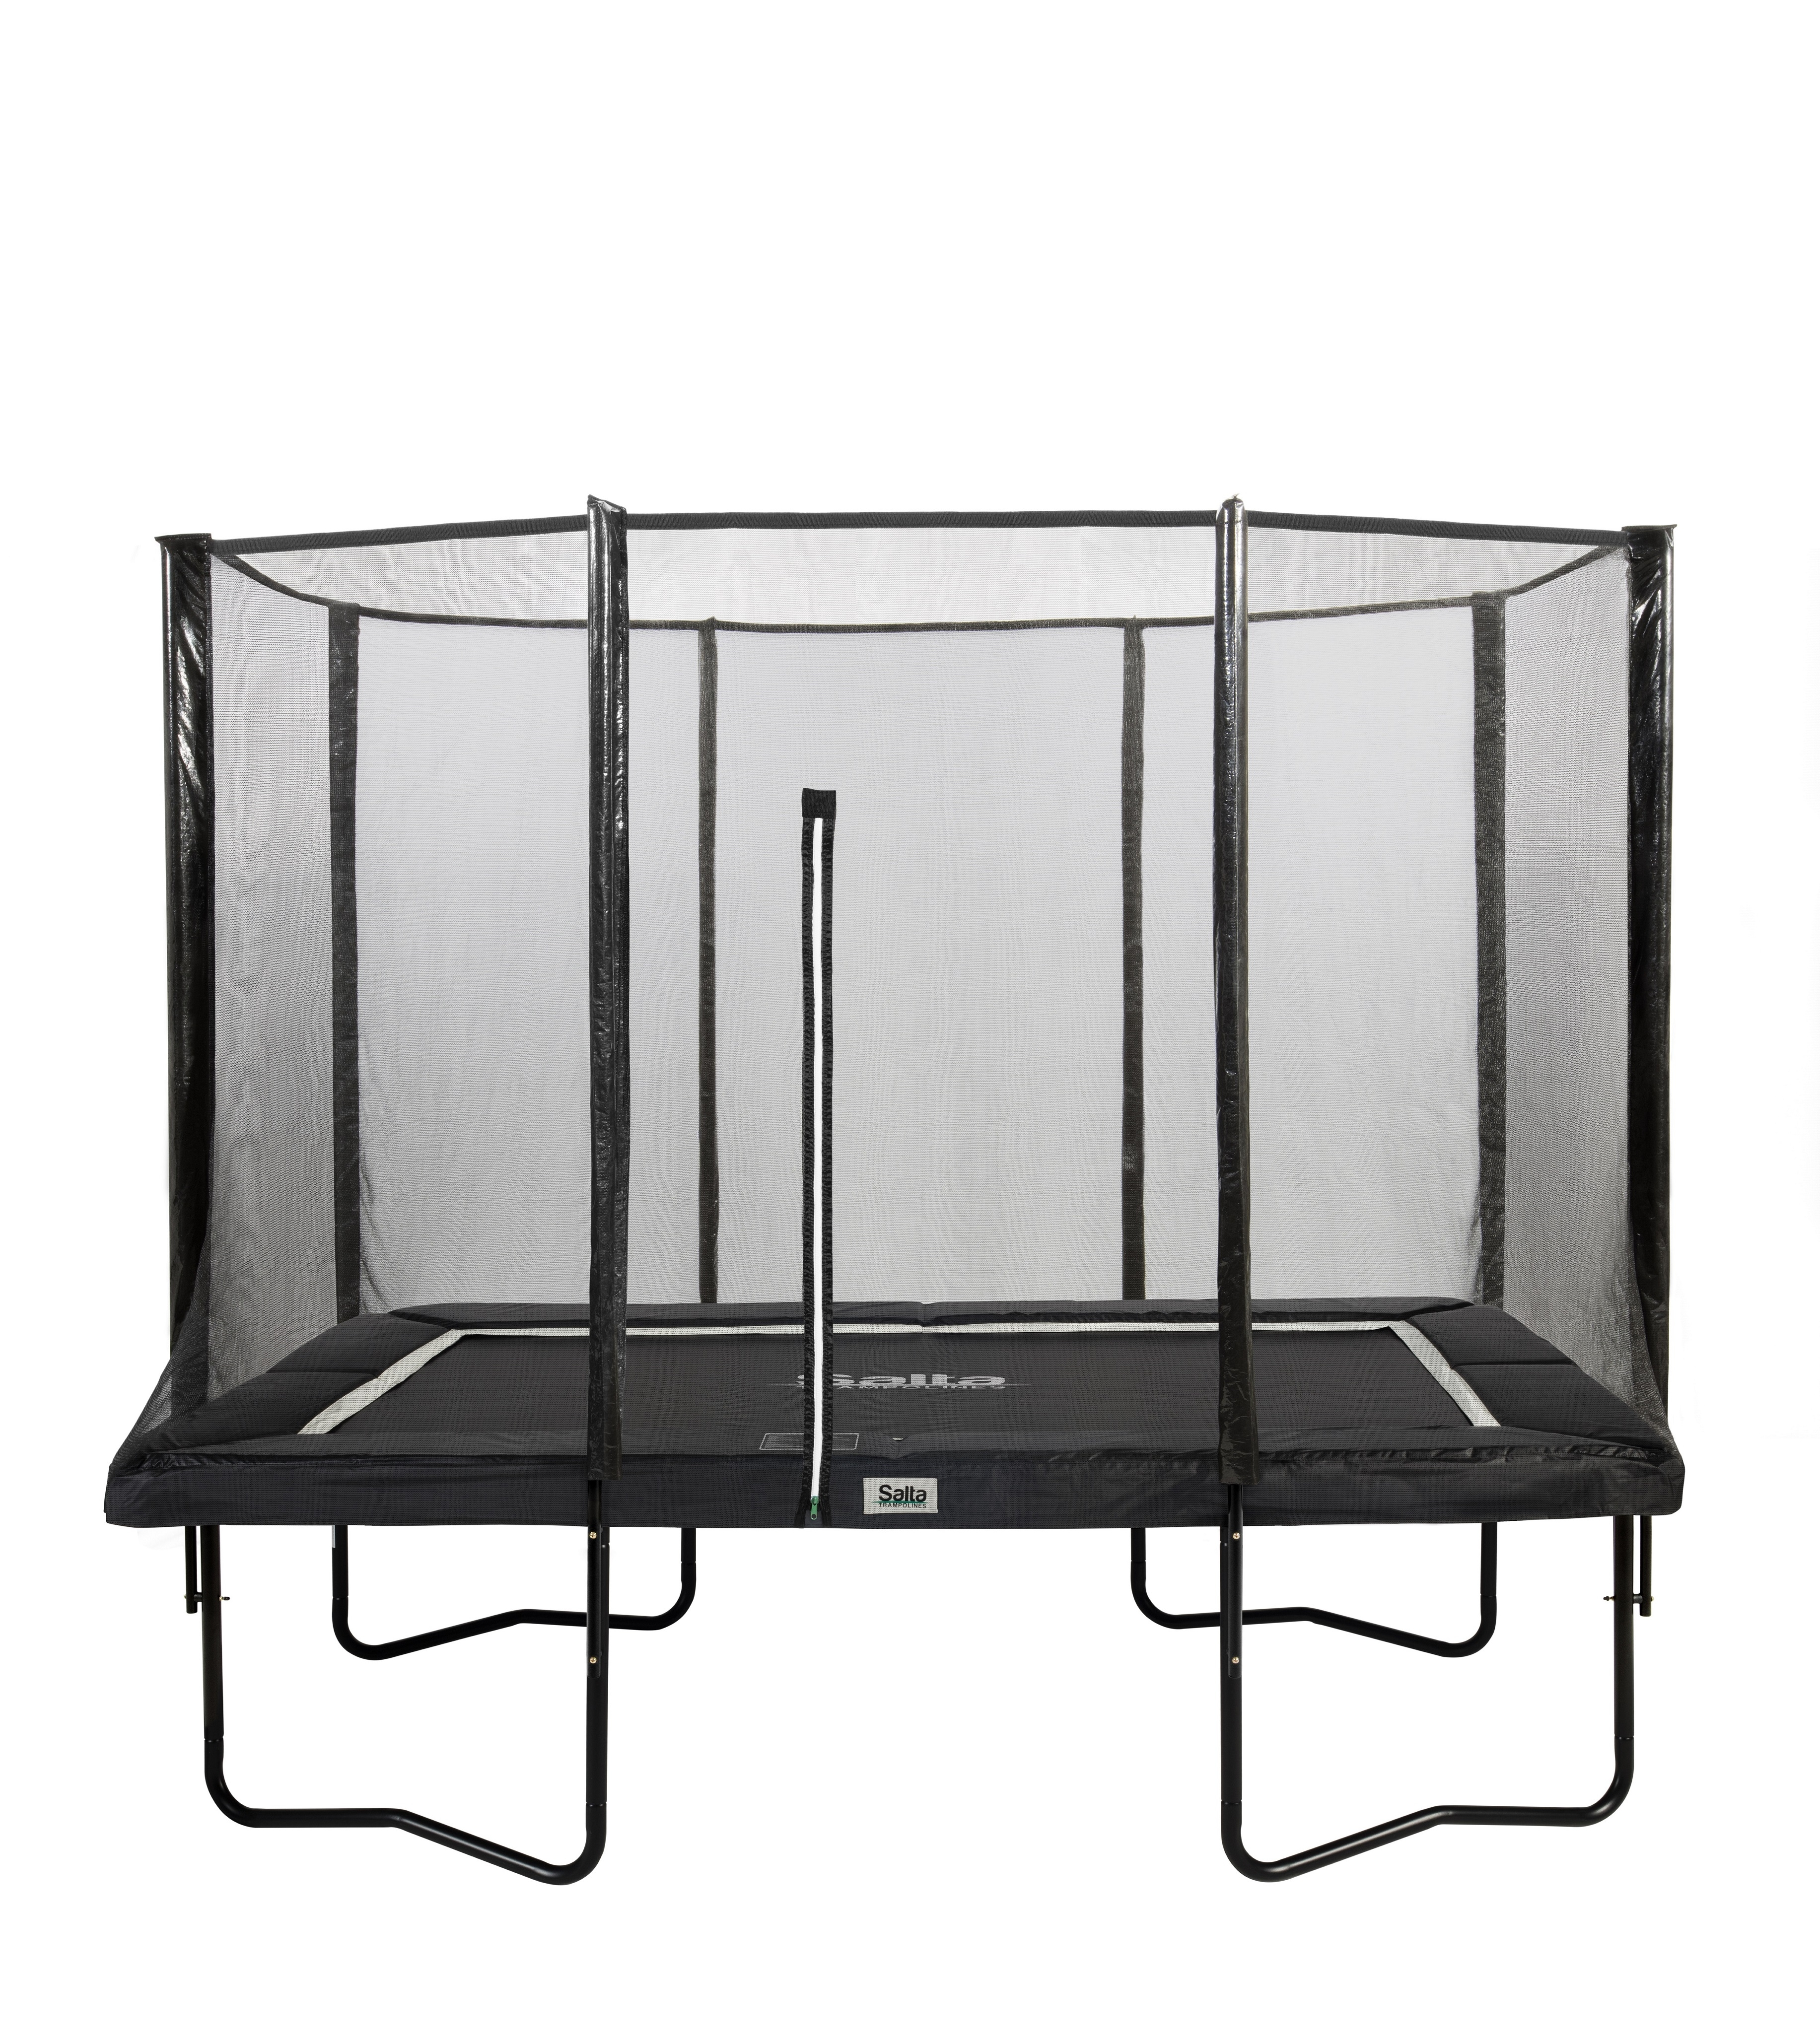 Image of   Salta Premium Black Edition Combo Trampolin - 153 x 214 cm - Sort